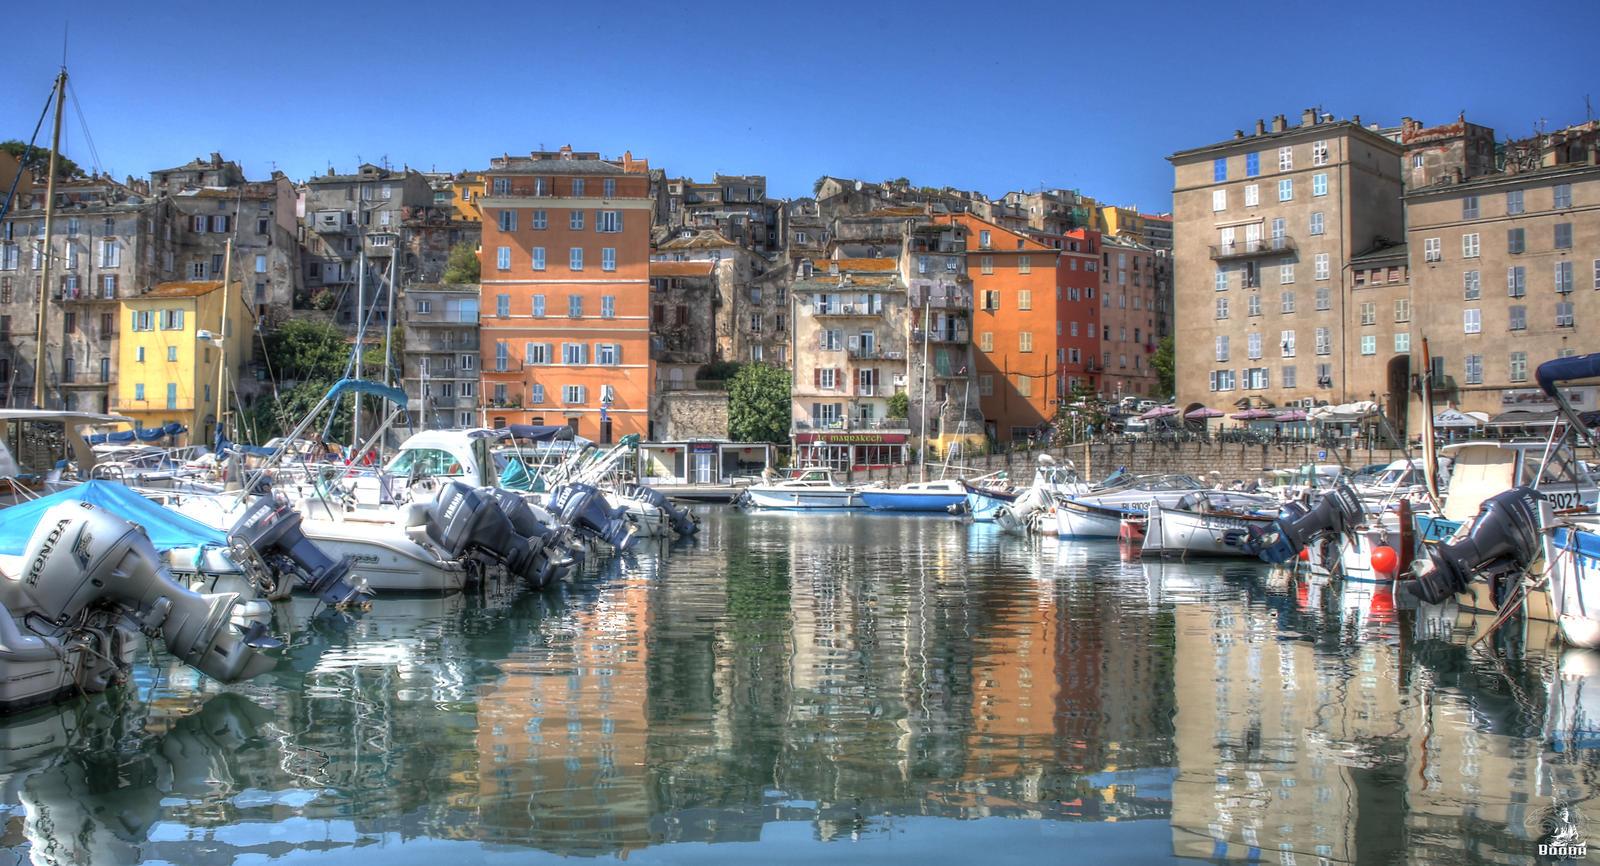 Le port de Bastia 3 by BoOdA6tem on DeviantArt